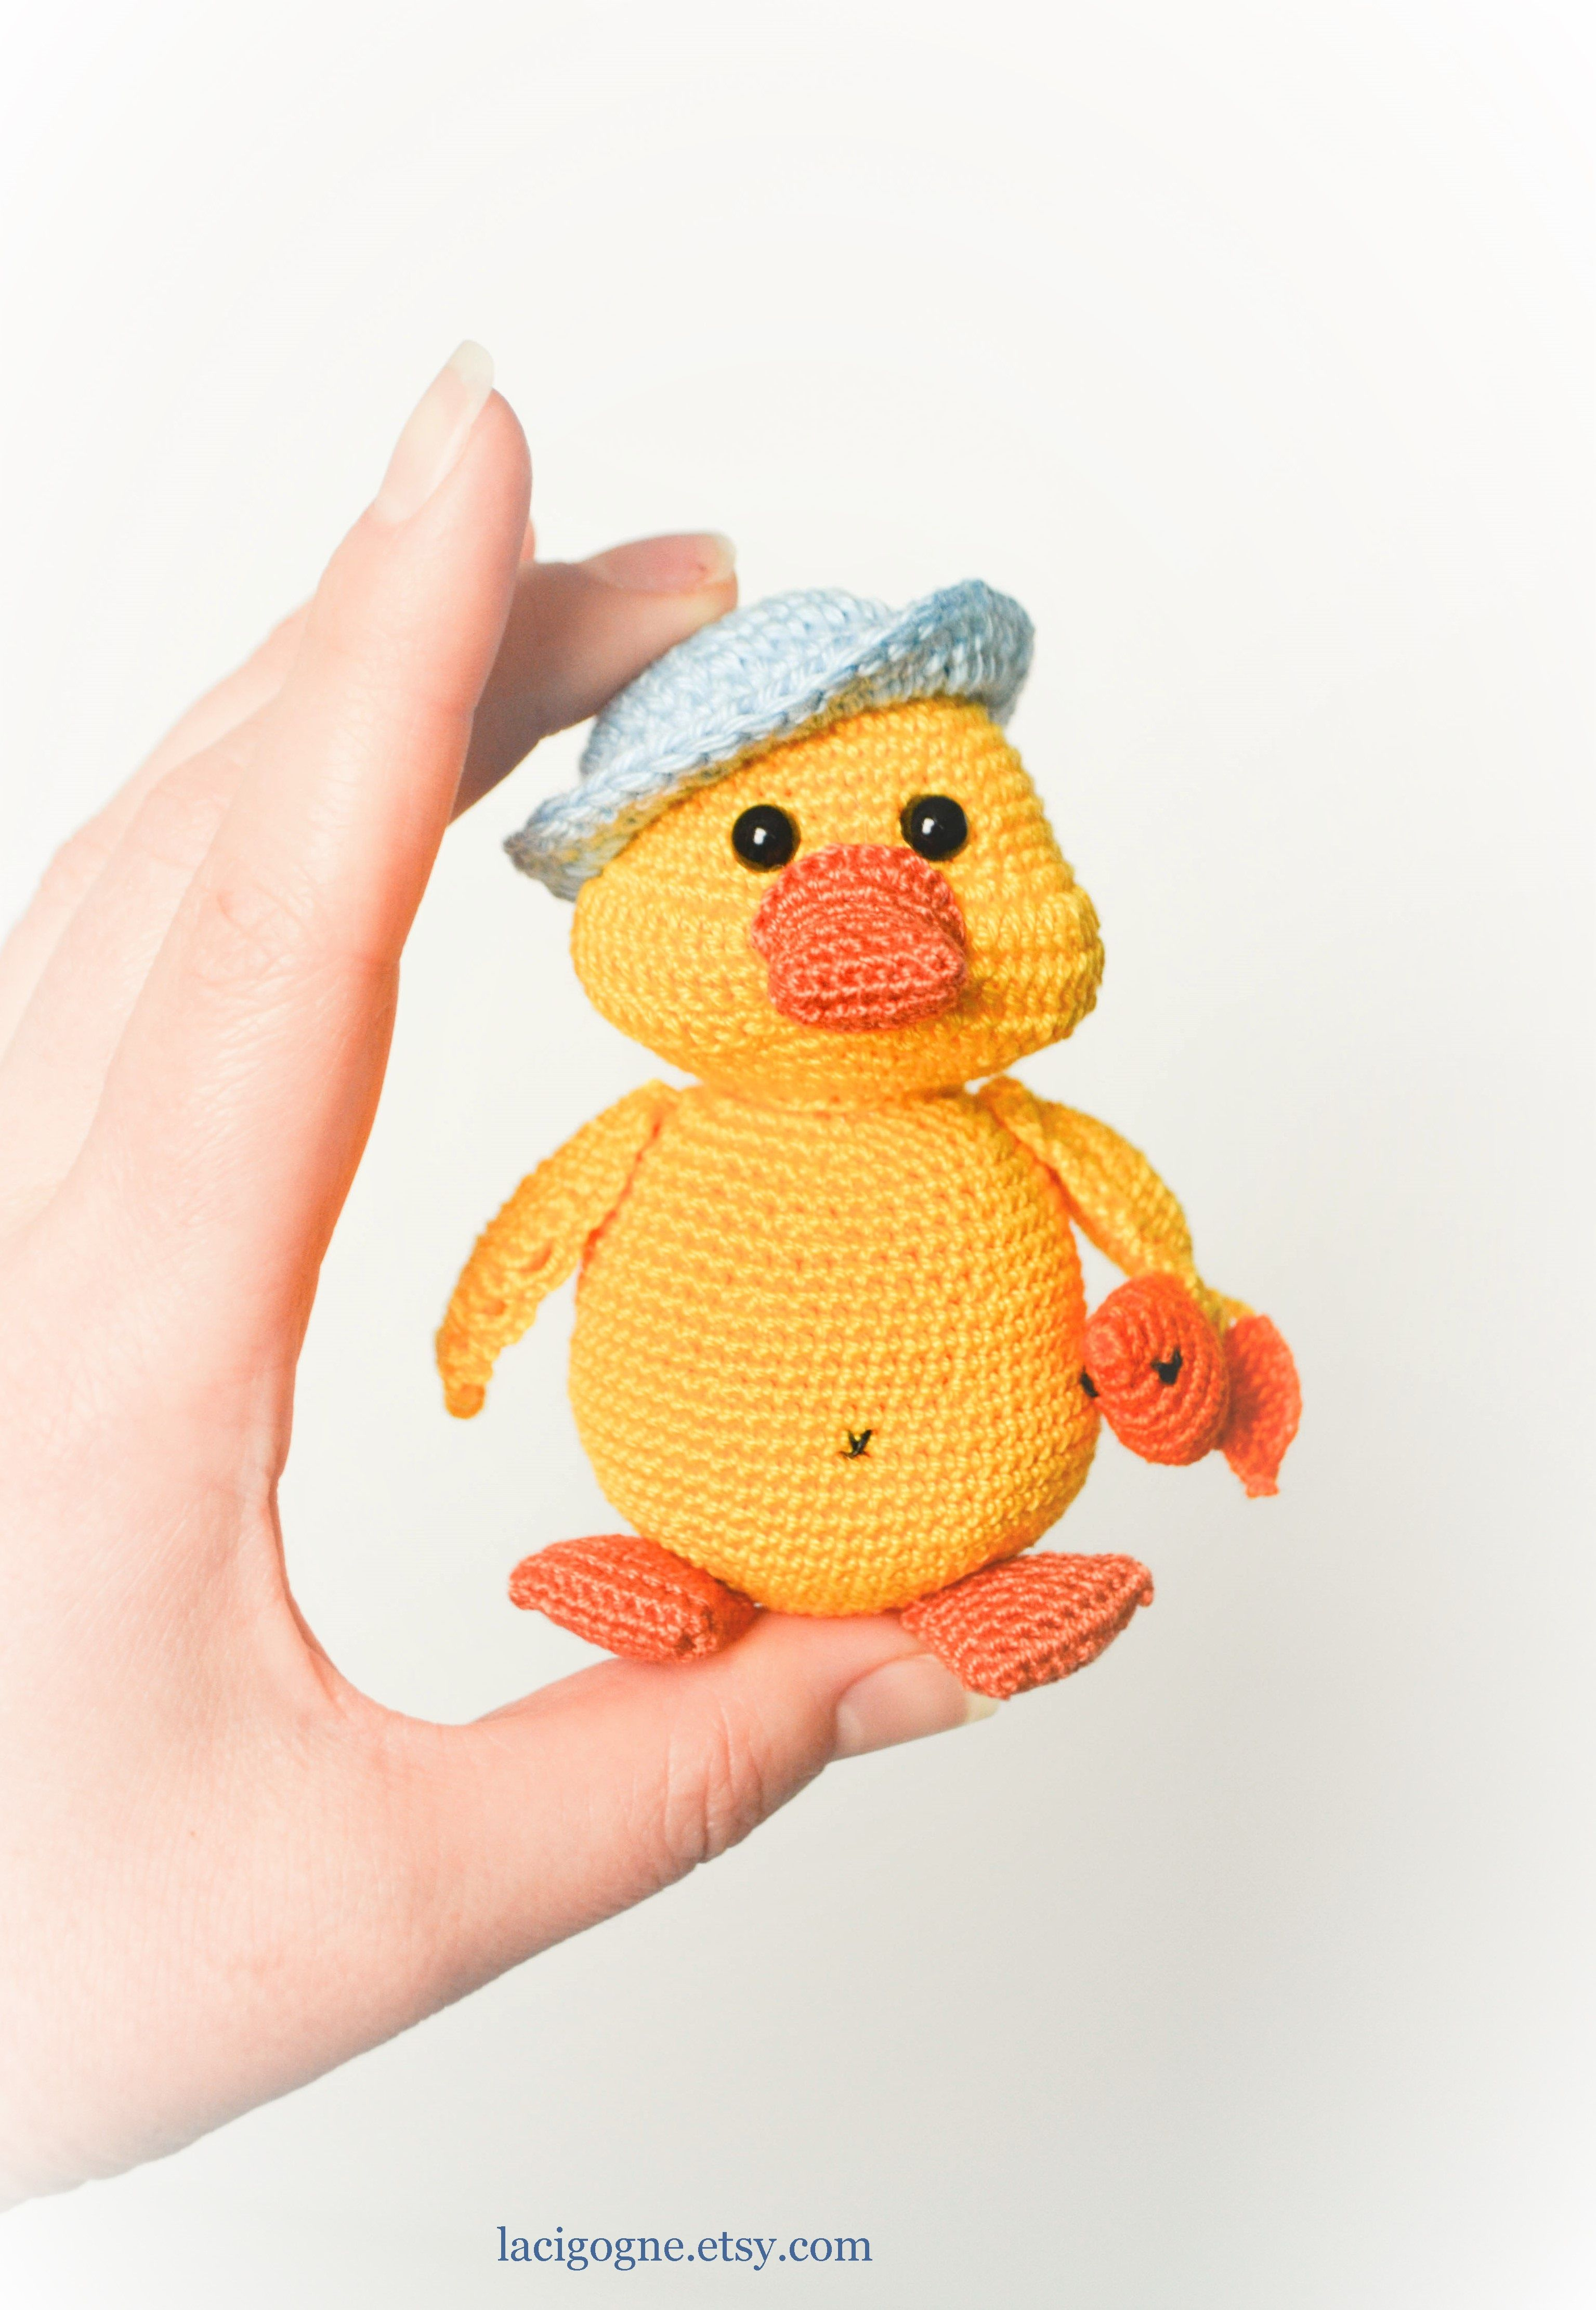 Pattern Max The Cute Duck Crochet Amigurumi Pattern Toy Duckling